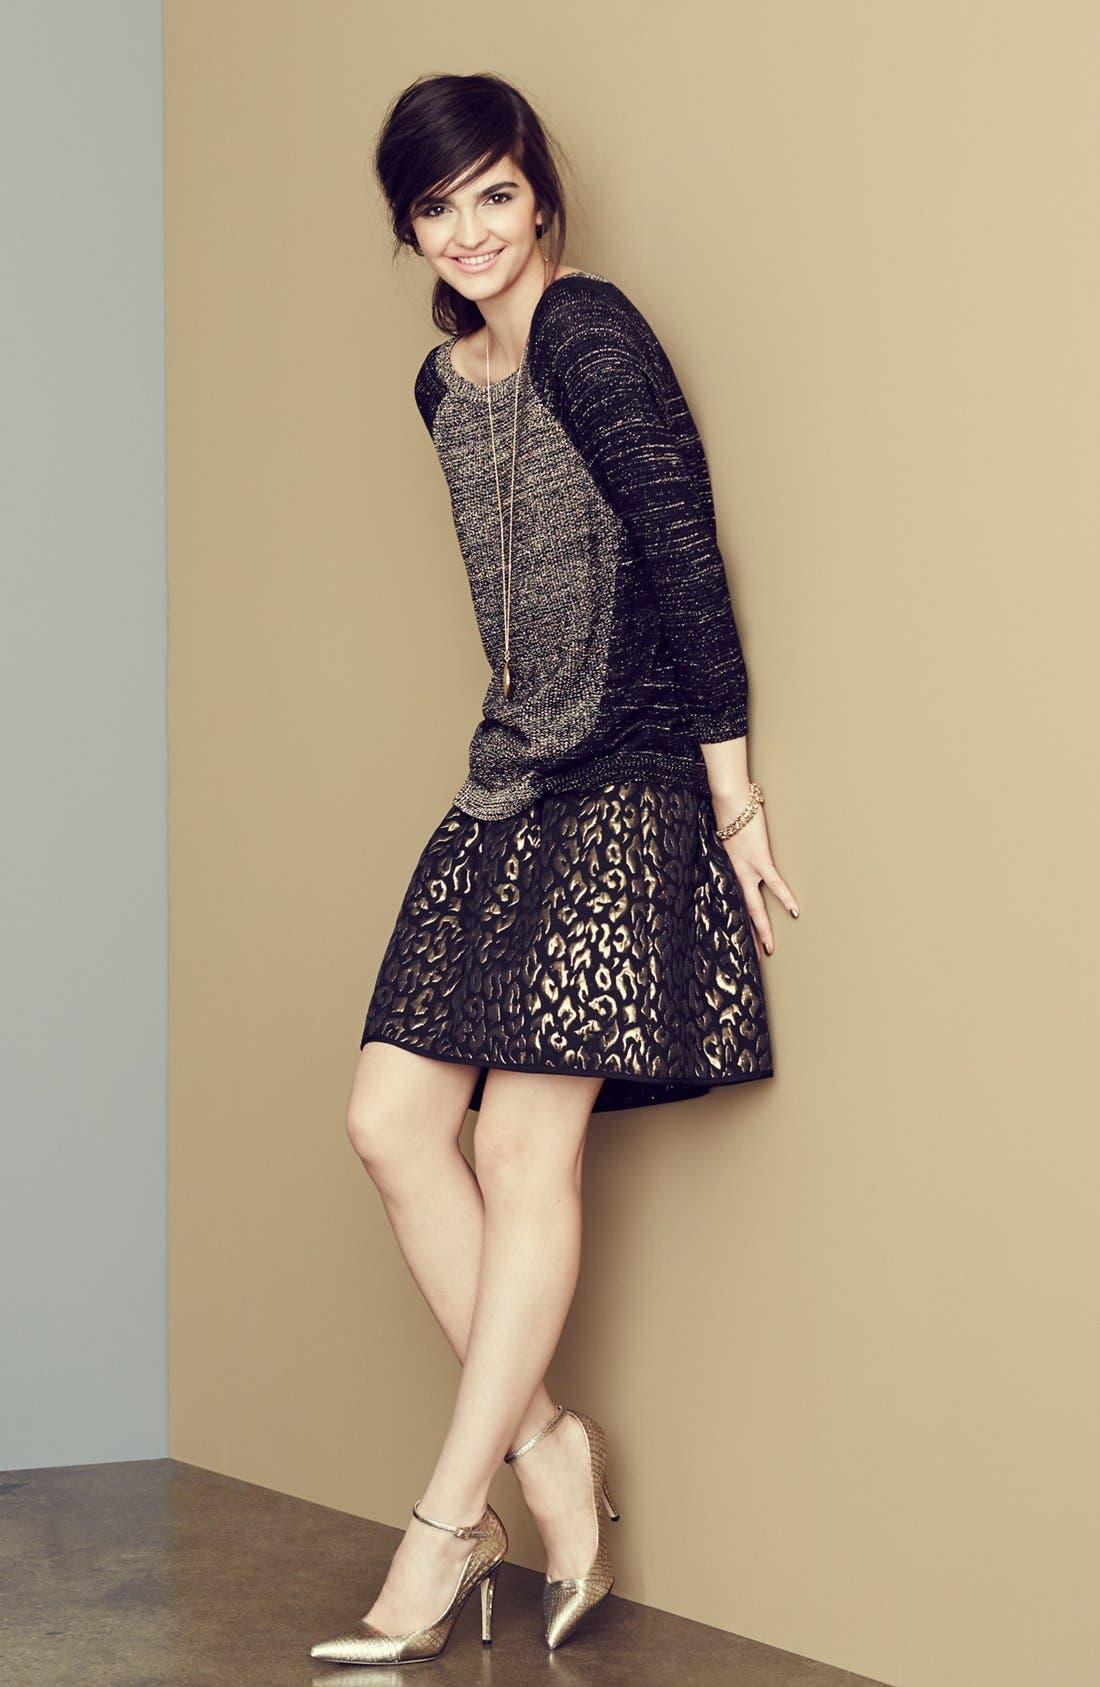 Main Image - Kenneth Cole New York Metallic Sweater & Print Skirt